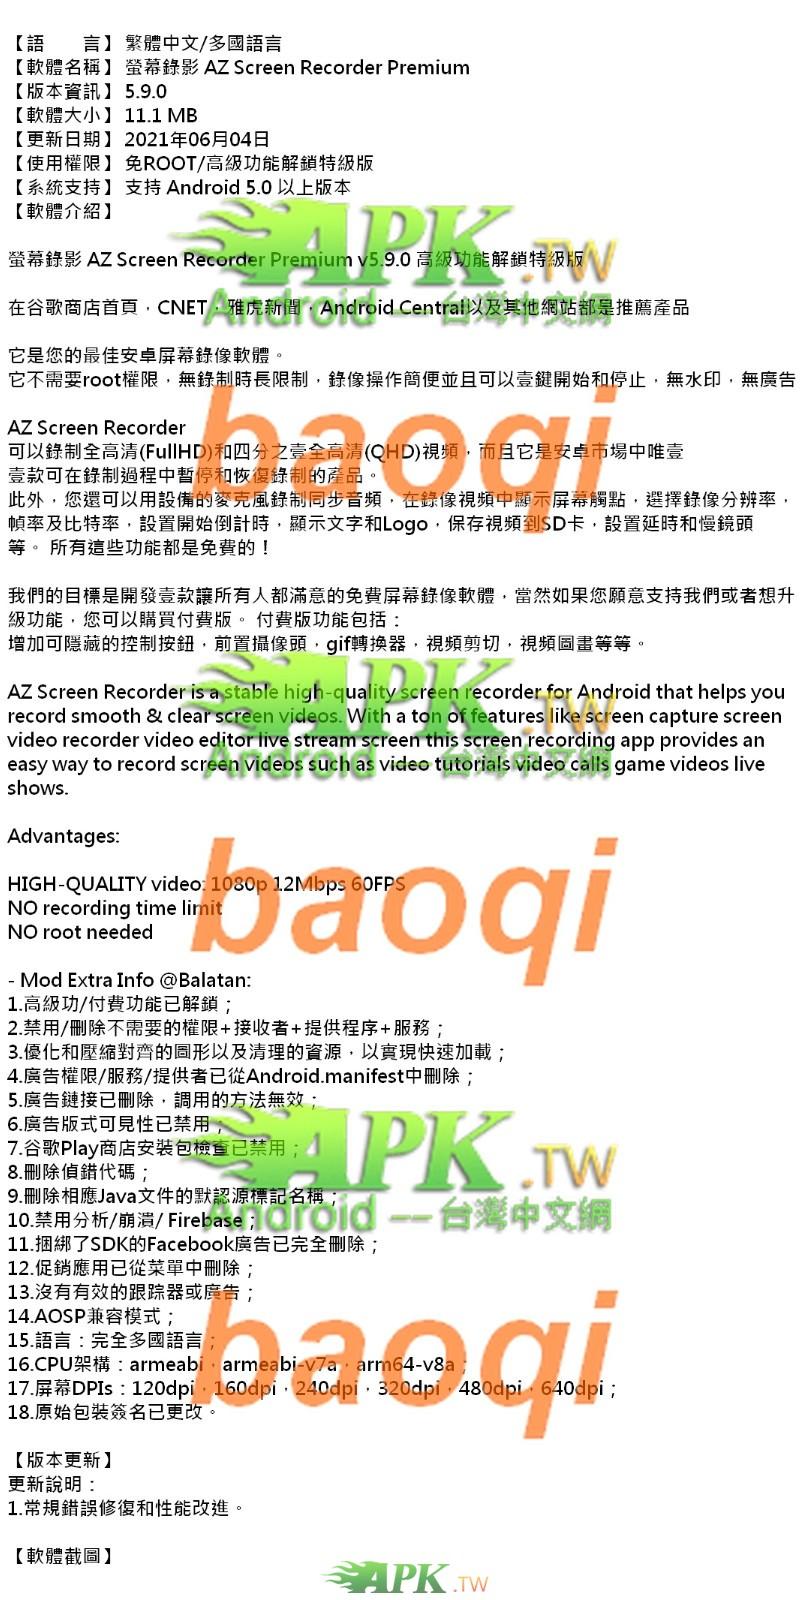 AZ_ScreenRecorder_Premium_5.9.0_.jpg